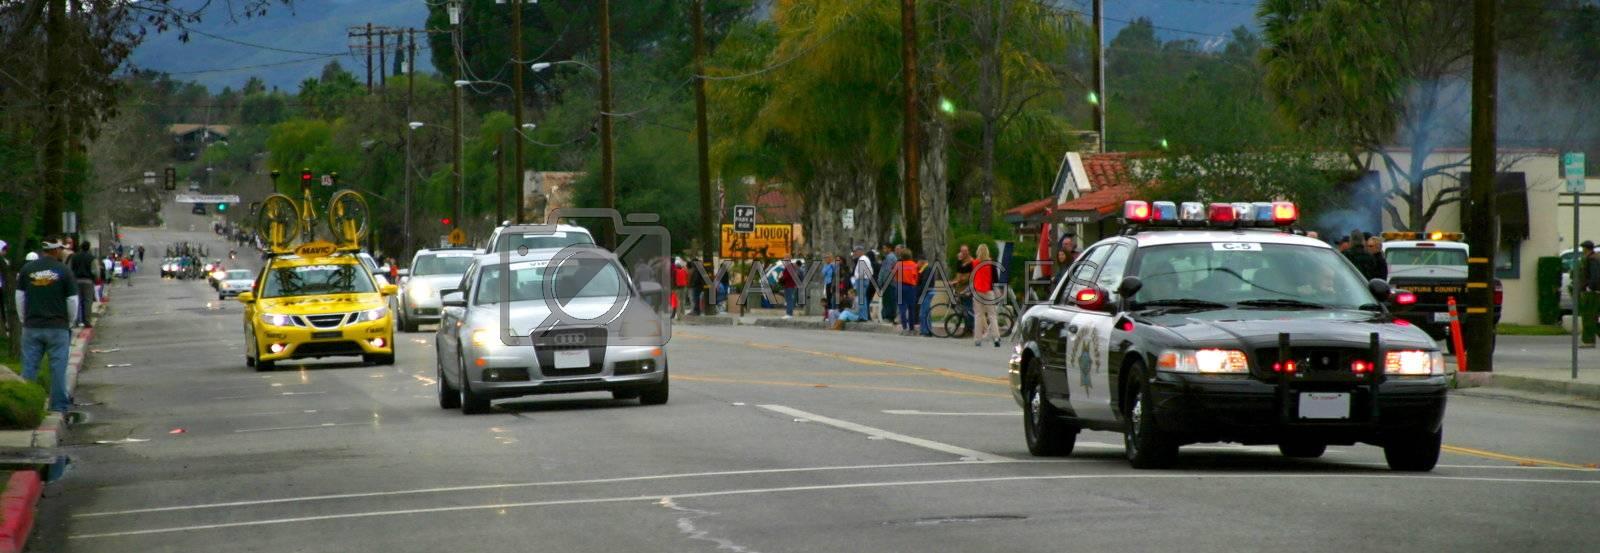 Amgen Tour Of California (6015) by hlehnerer